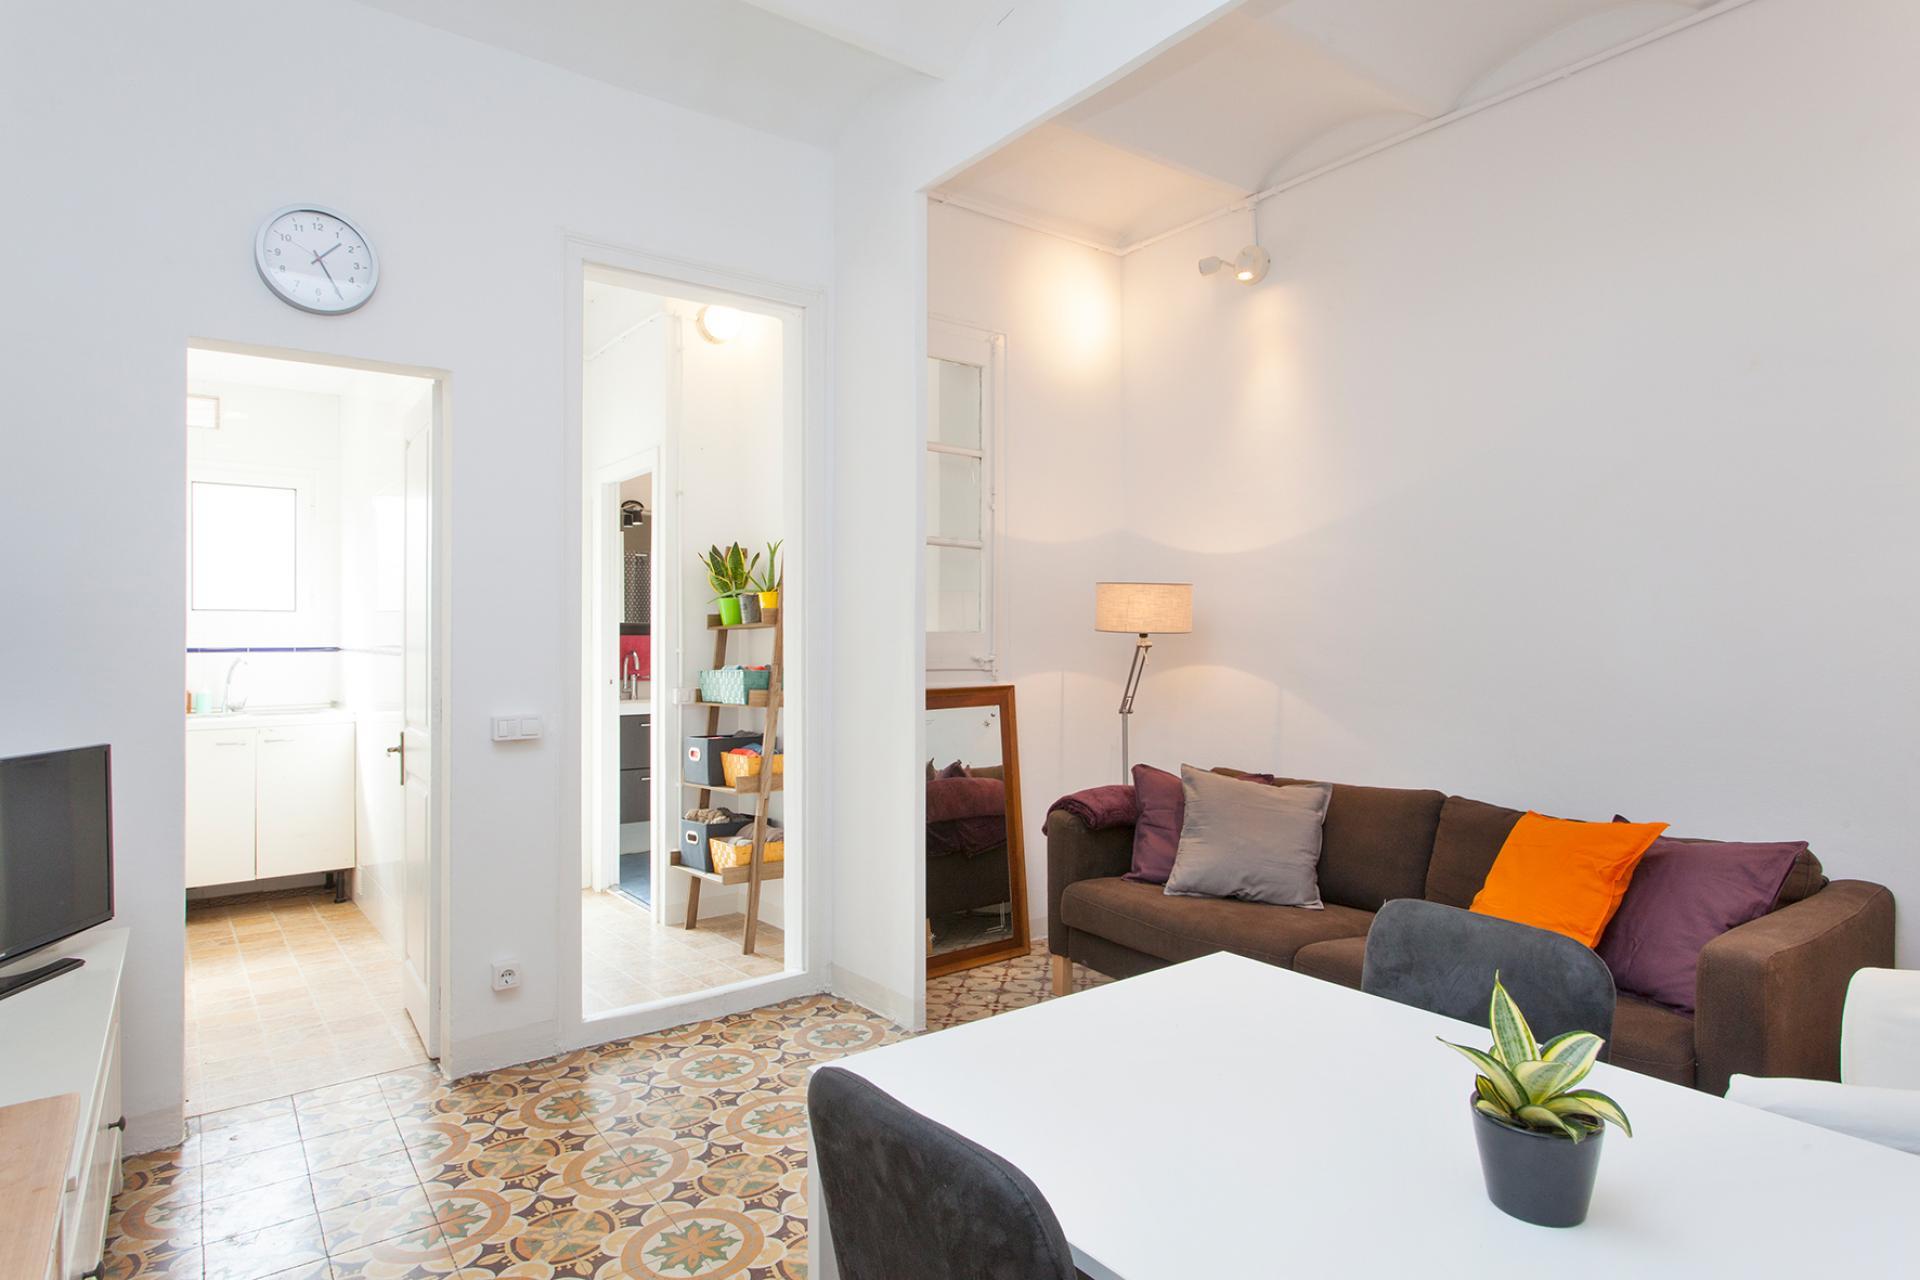 Wohnung zur Miete in Barcelona Marià Aguiló - Pallars